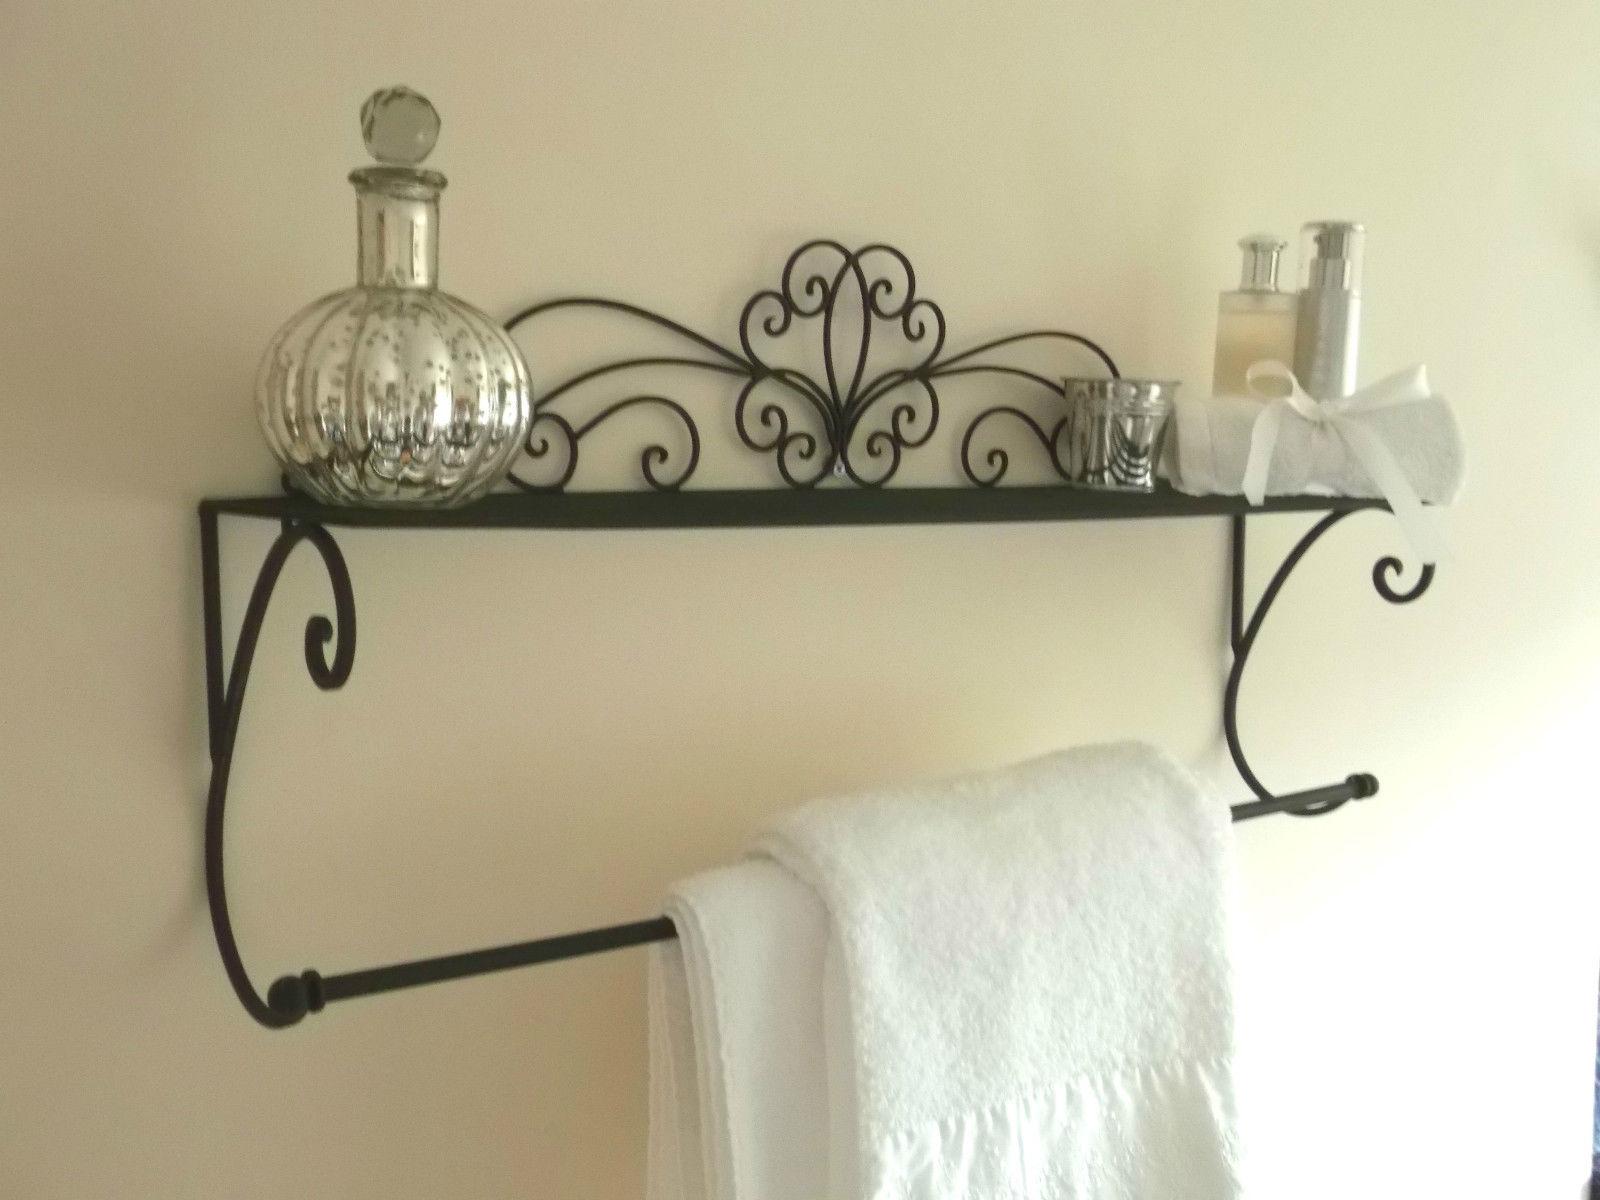 Black Metal Wall Mounted Towel Rail & Shelf